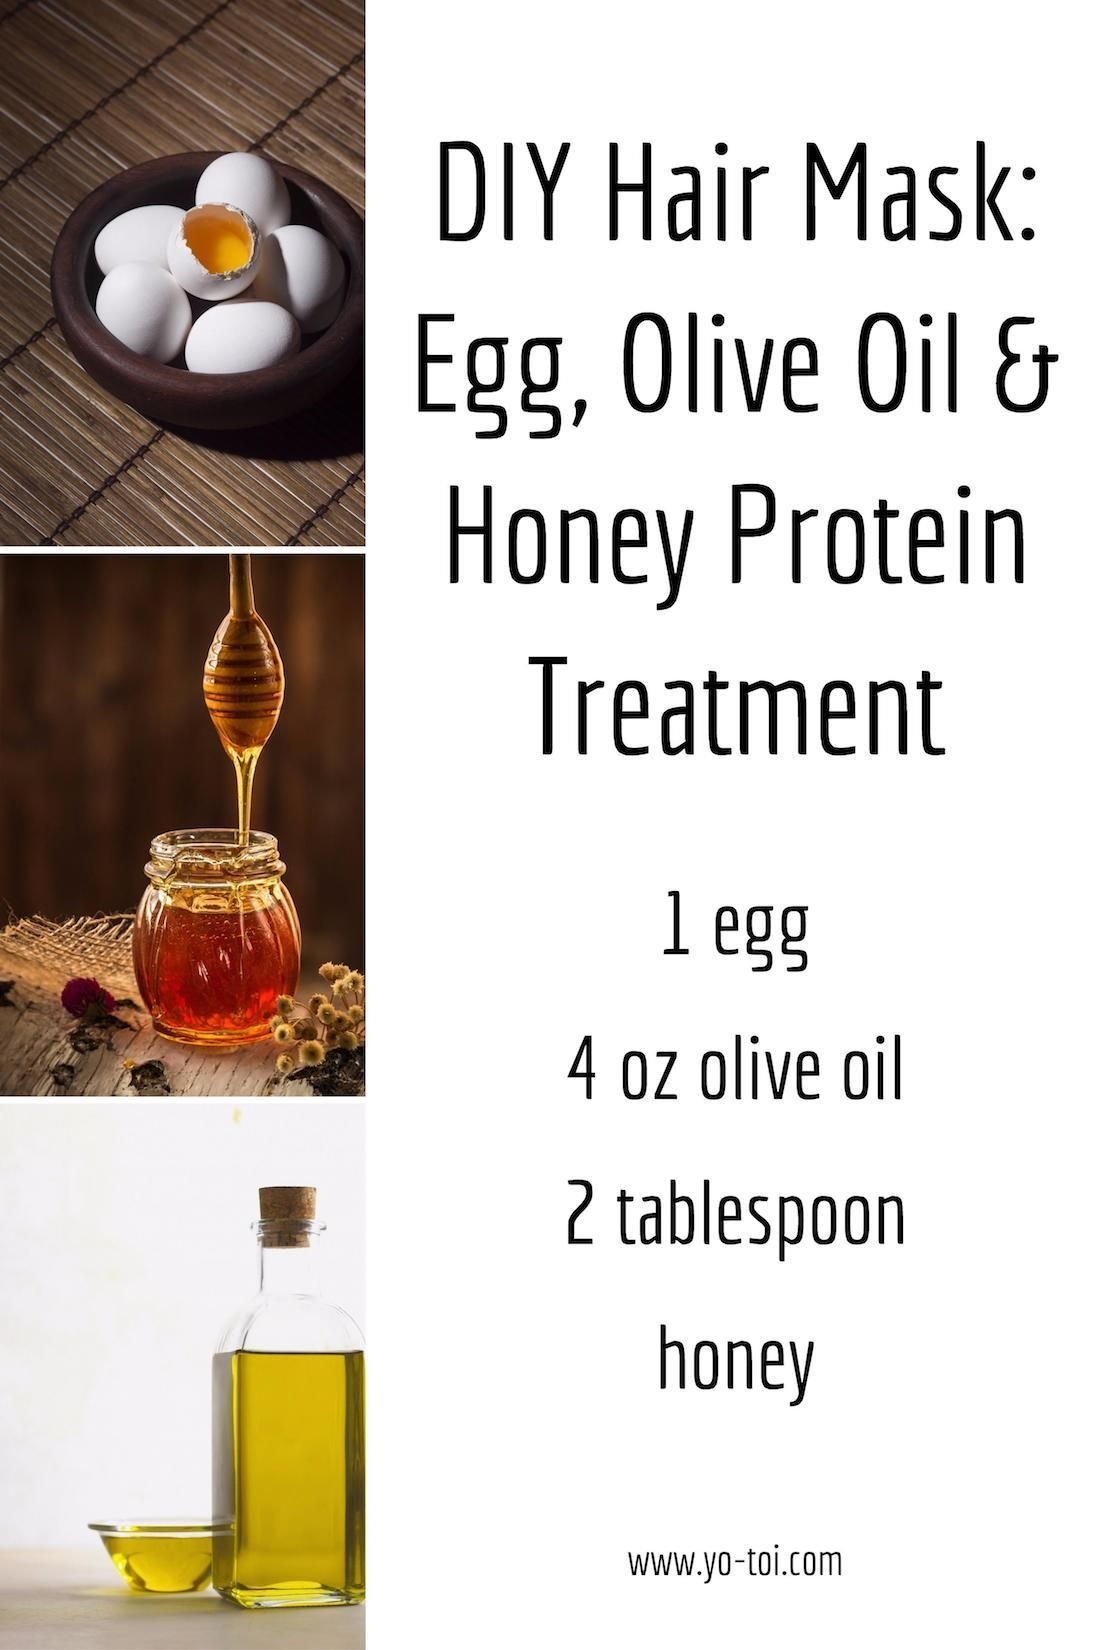 DIY Hair Mask Egg, Olive Oil & Honey Protein Treatment